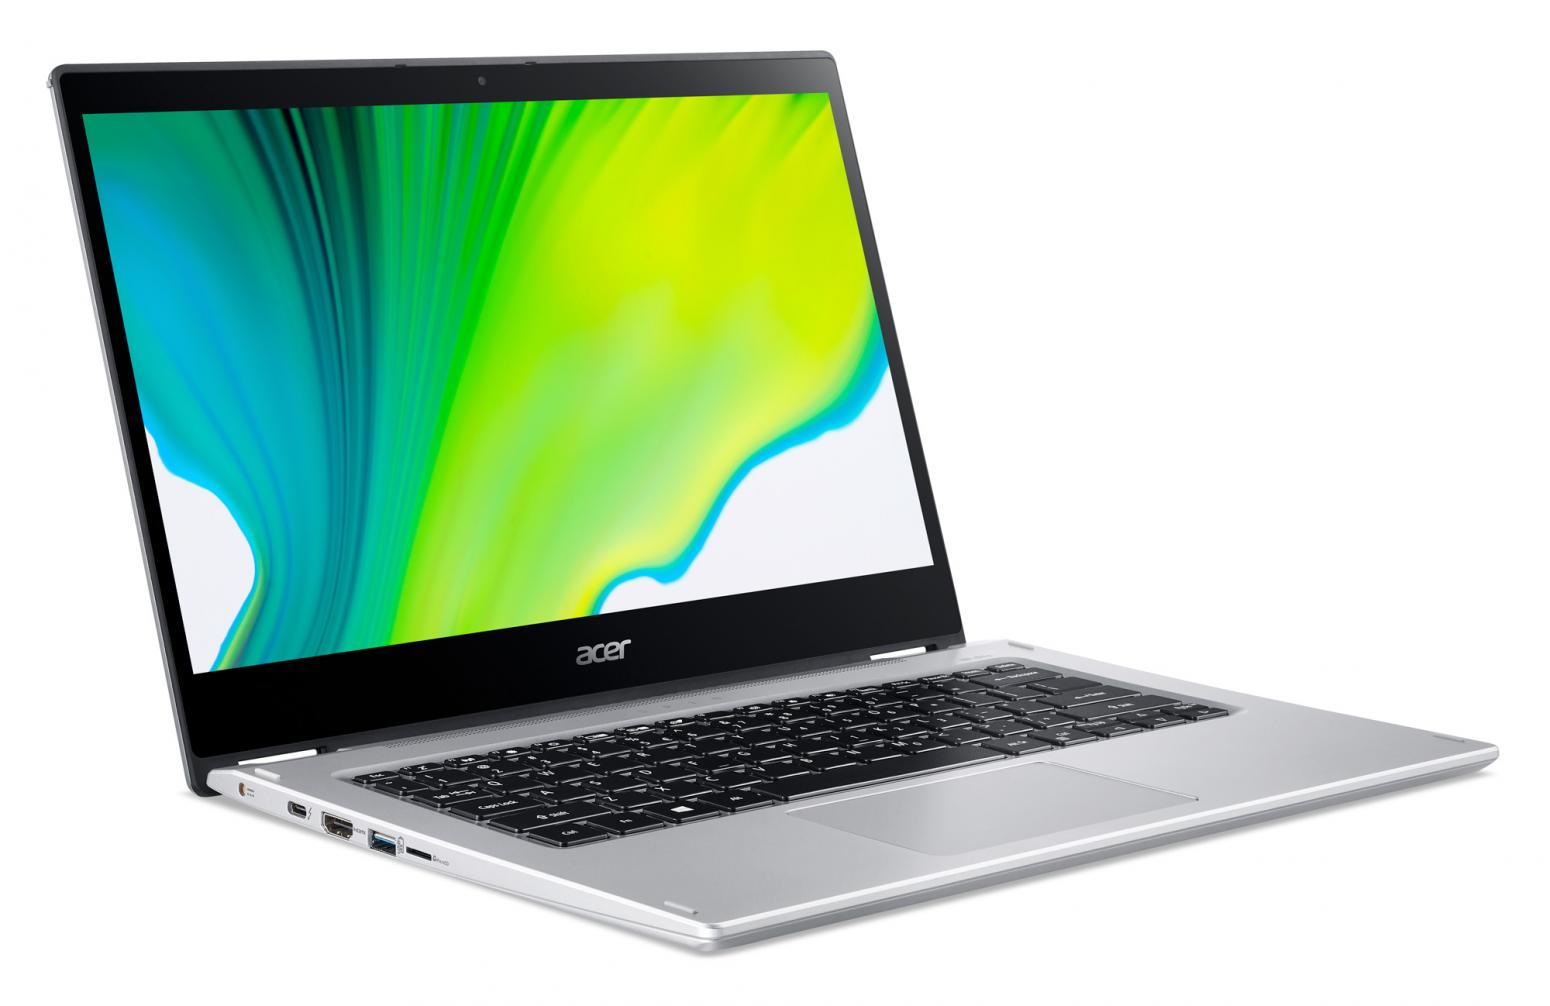 Ordinateur portable Acer Spin 3 SP314-54N-52H9 Argent - Tactile, Stylet - photo 2